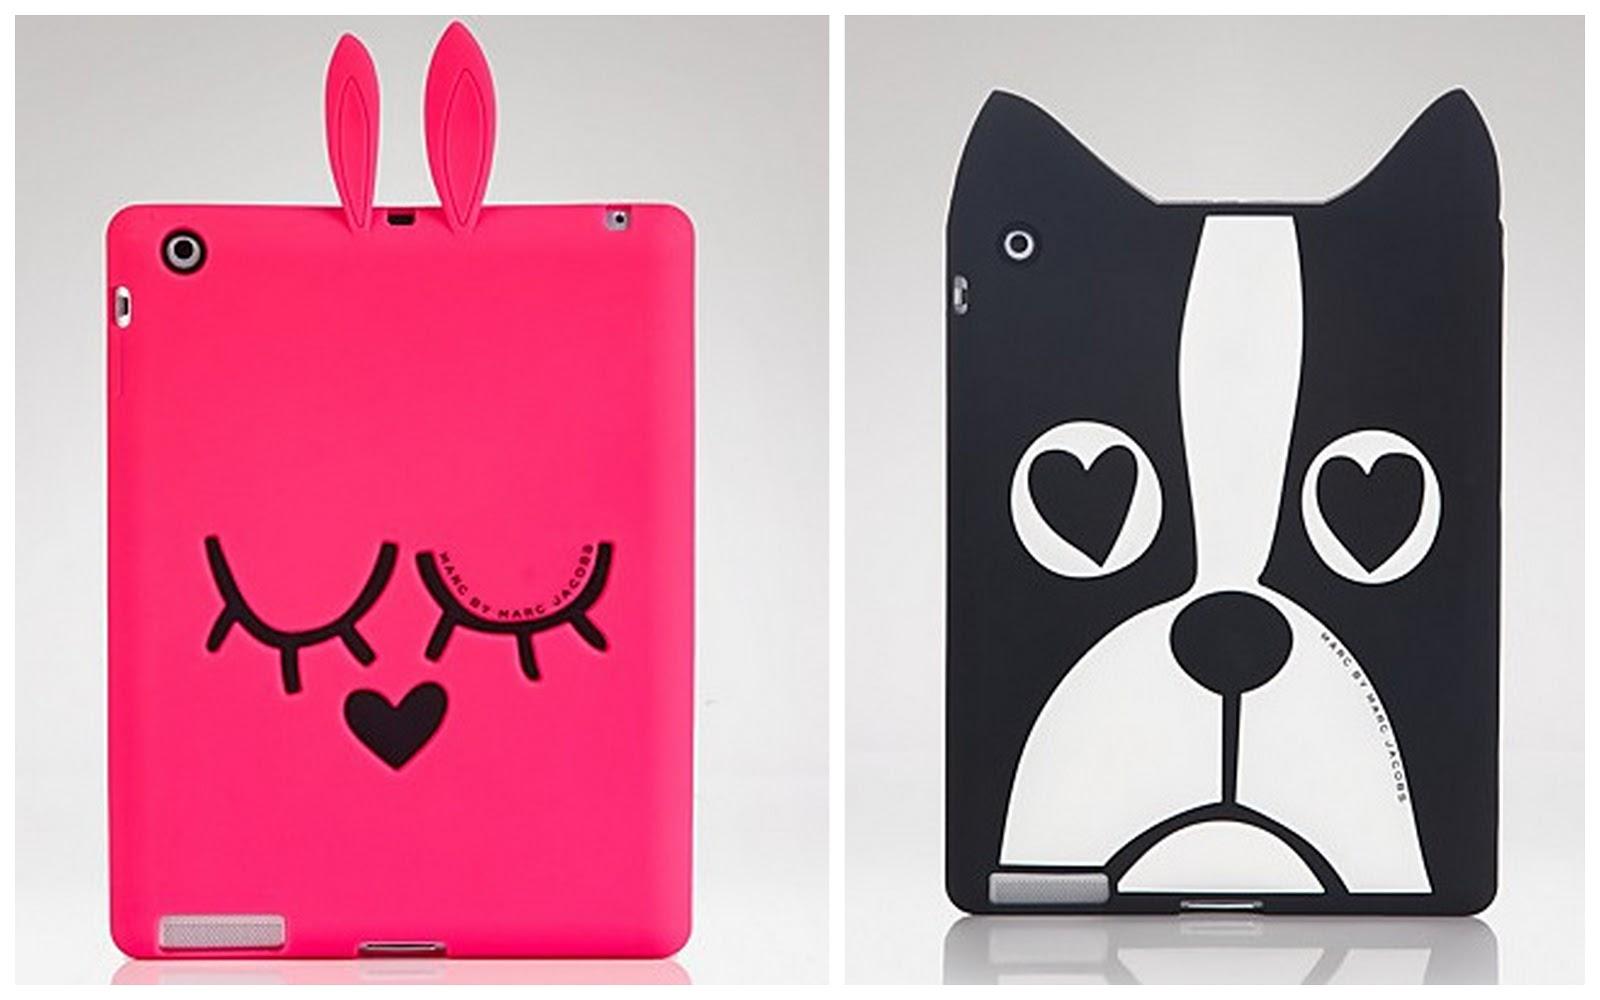 Glacu00ea do Bolo: Marc By Marc Jacobs lanu00e7a capa para tablets e iPad